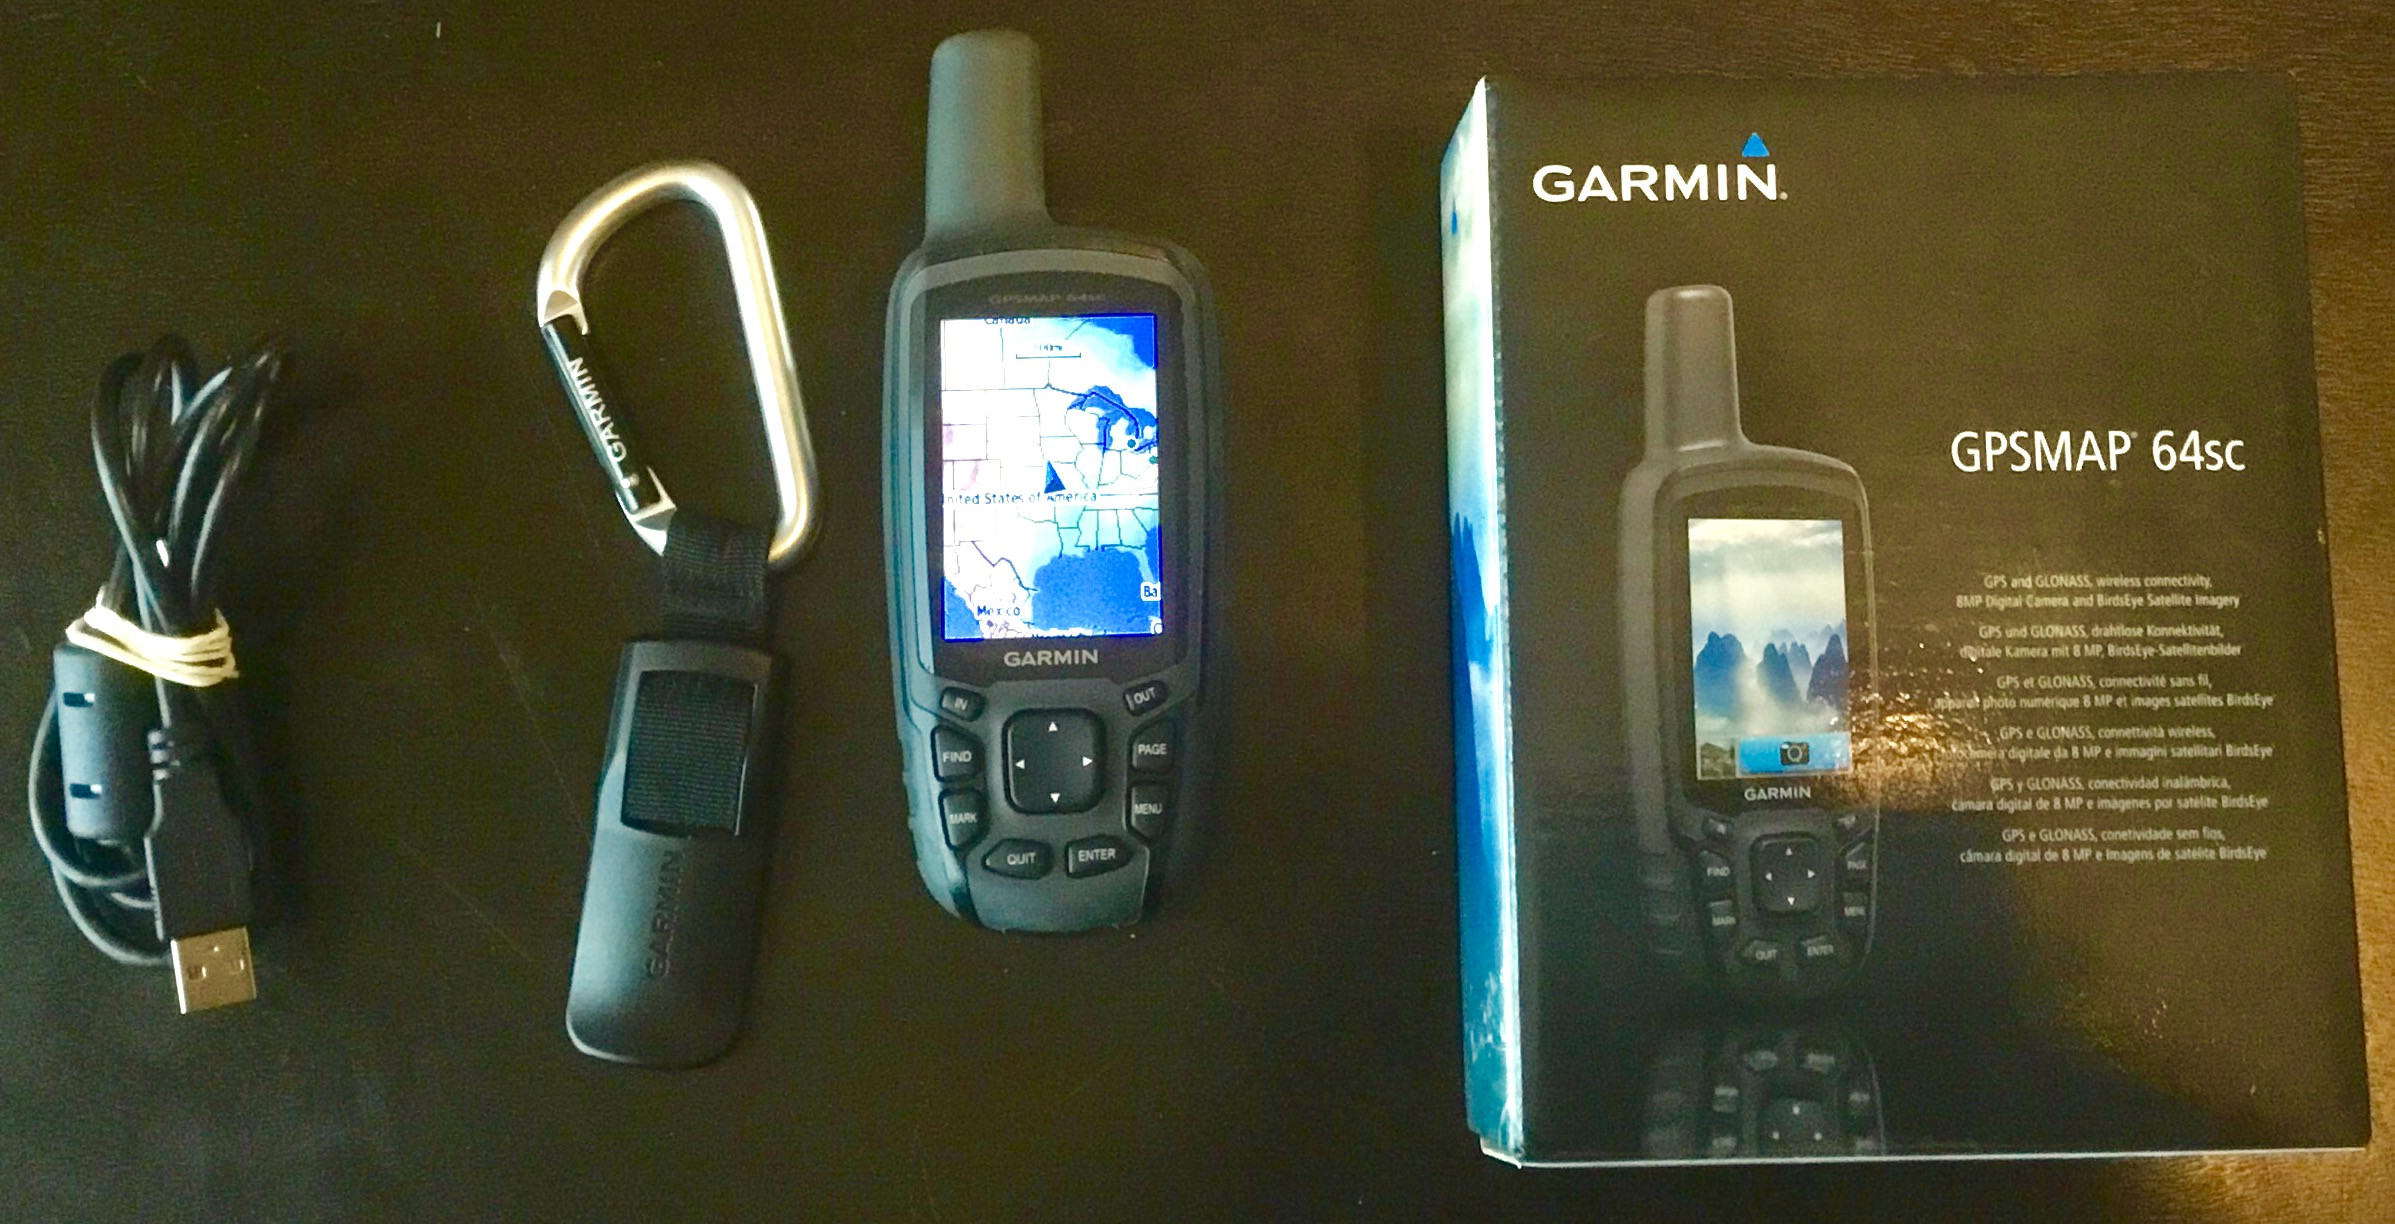 FS: Garmin GPSMAP 64sc - GPS Garage Sale - Geocaching Forums